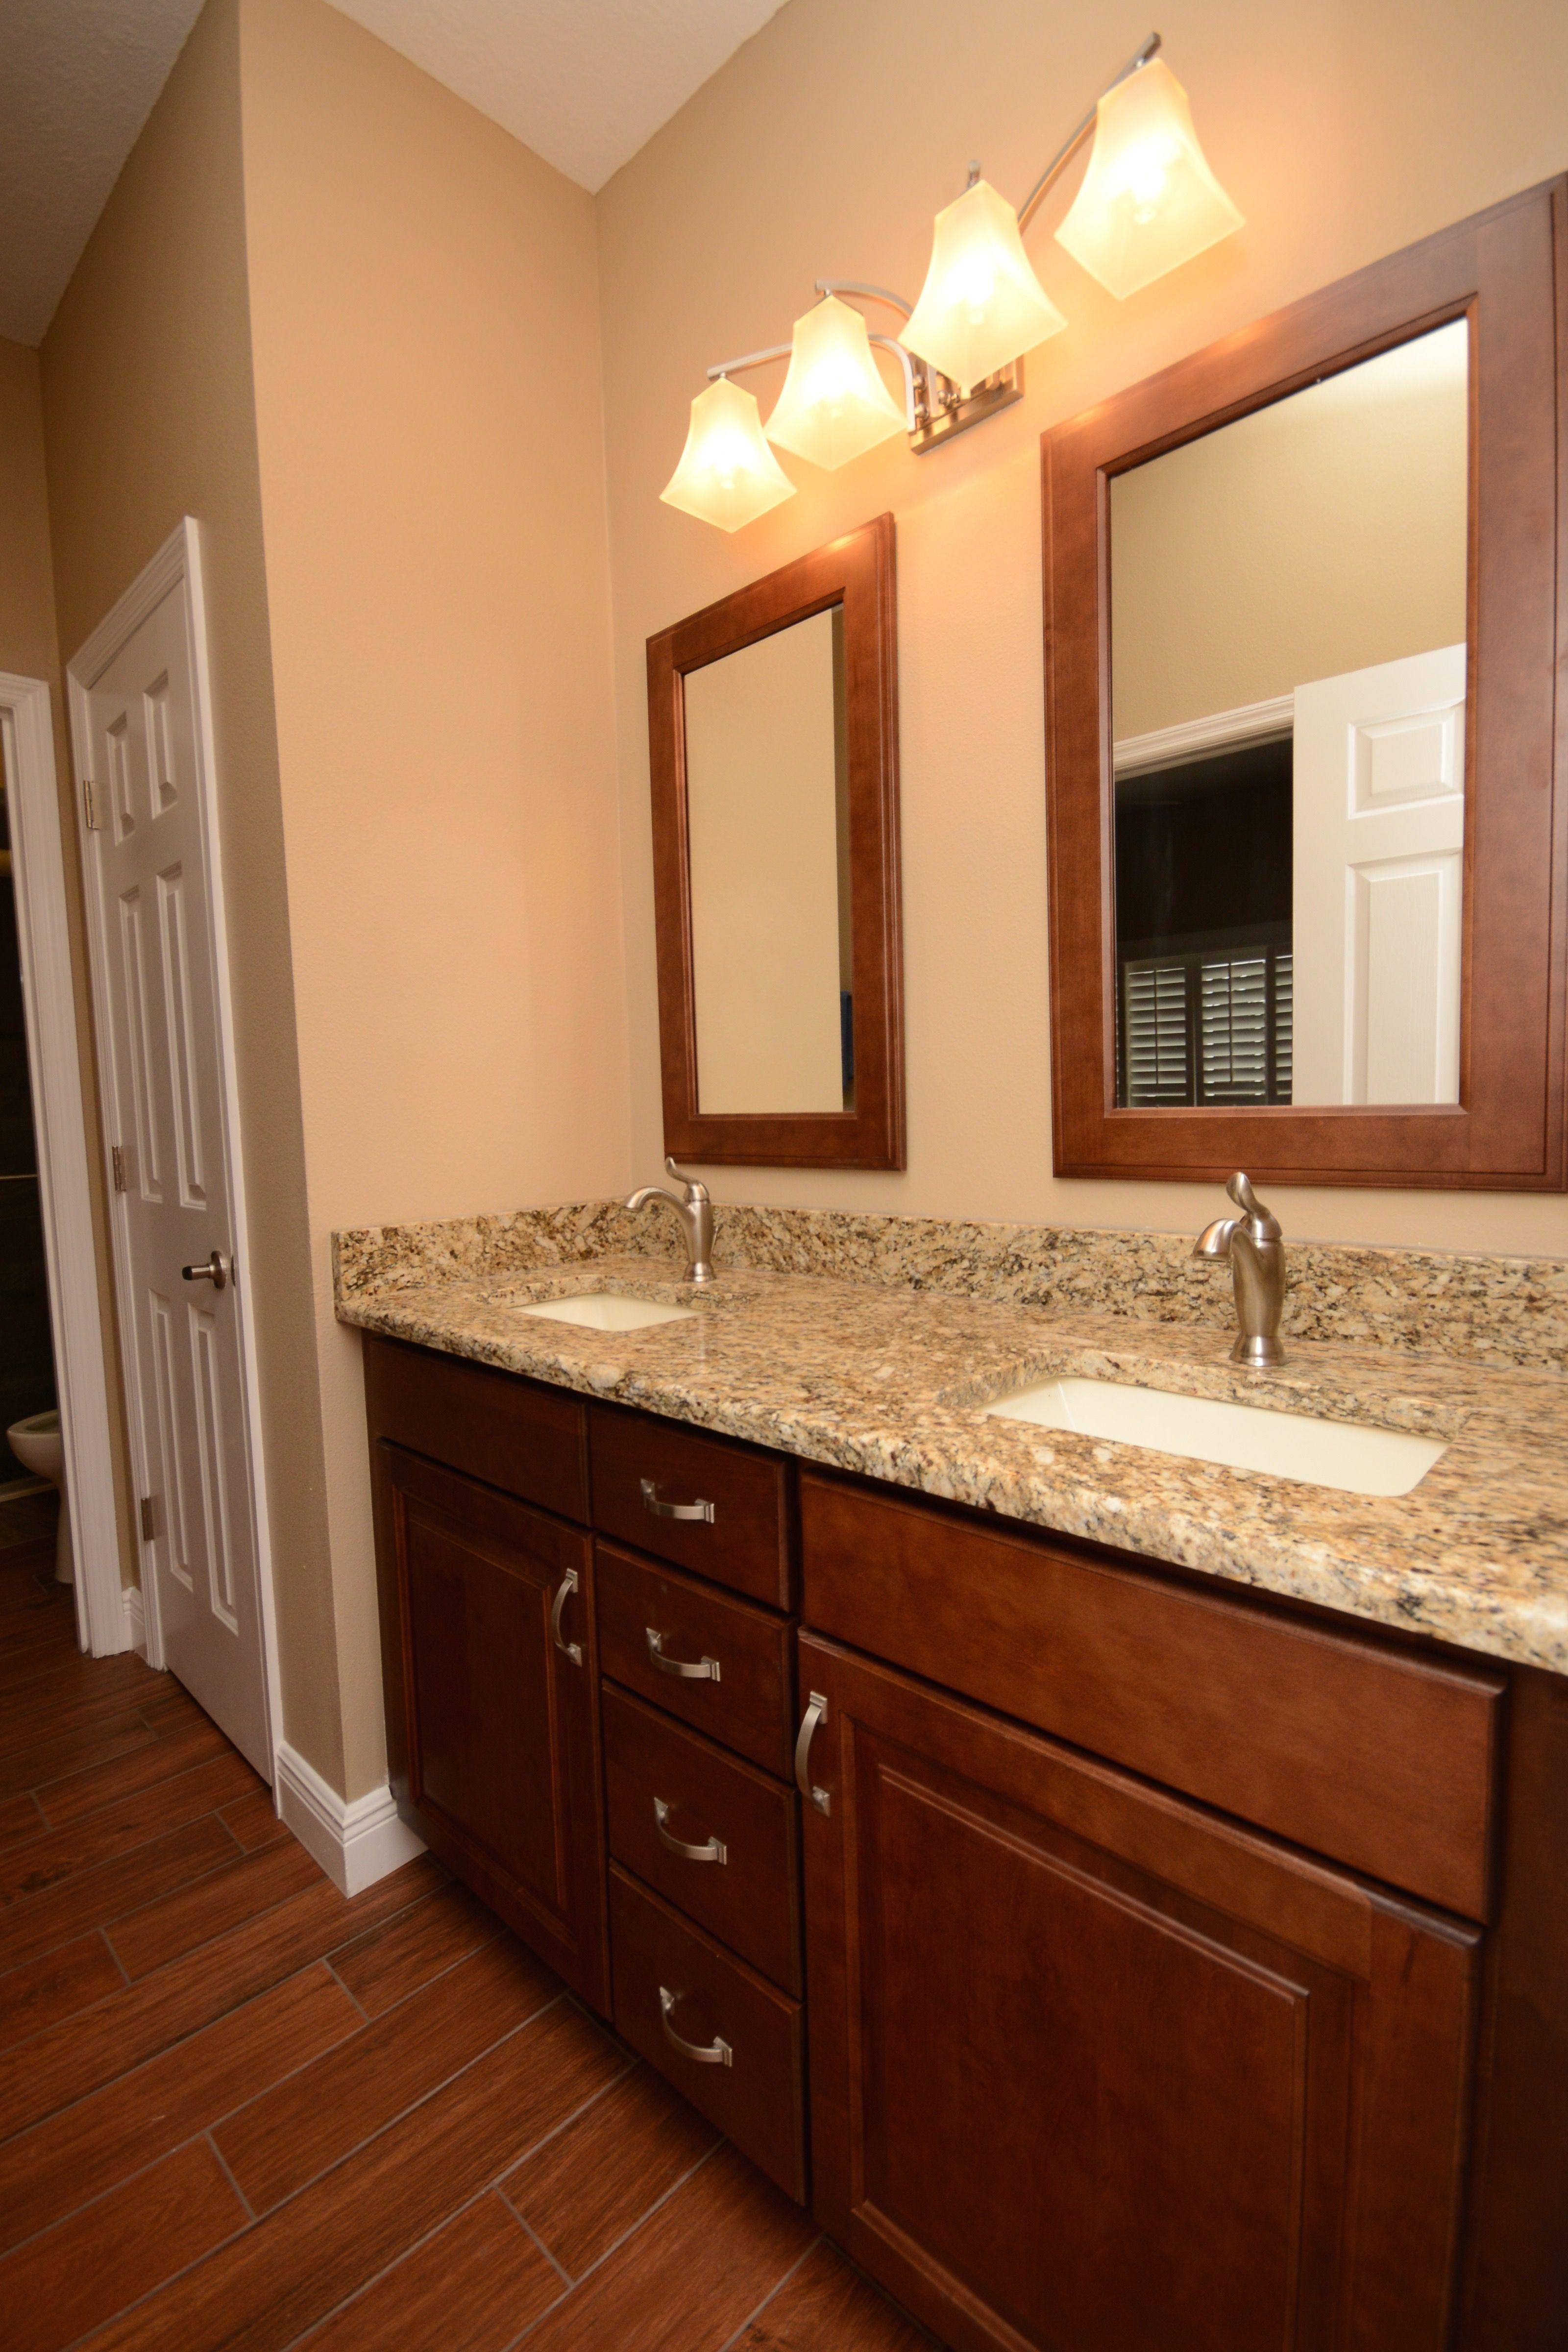 bathroom #bathtub #cabinets #hardware #remodel | BATHROOM PORTFOLIO ...